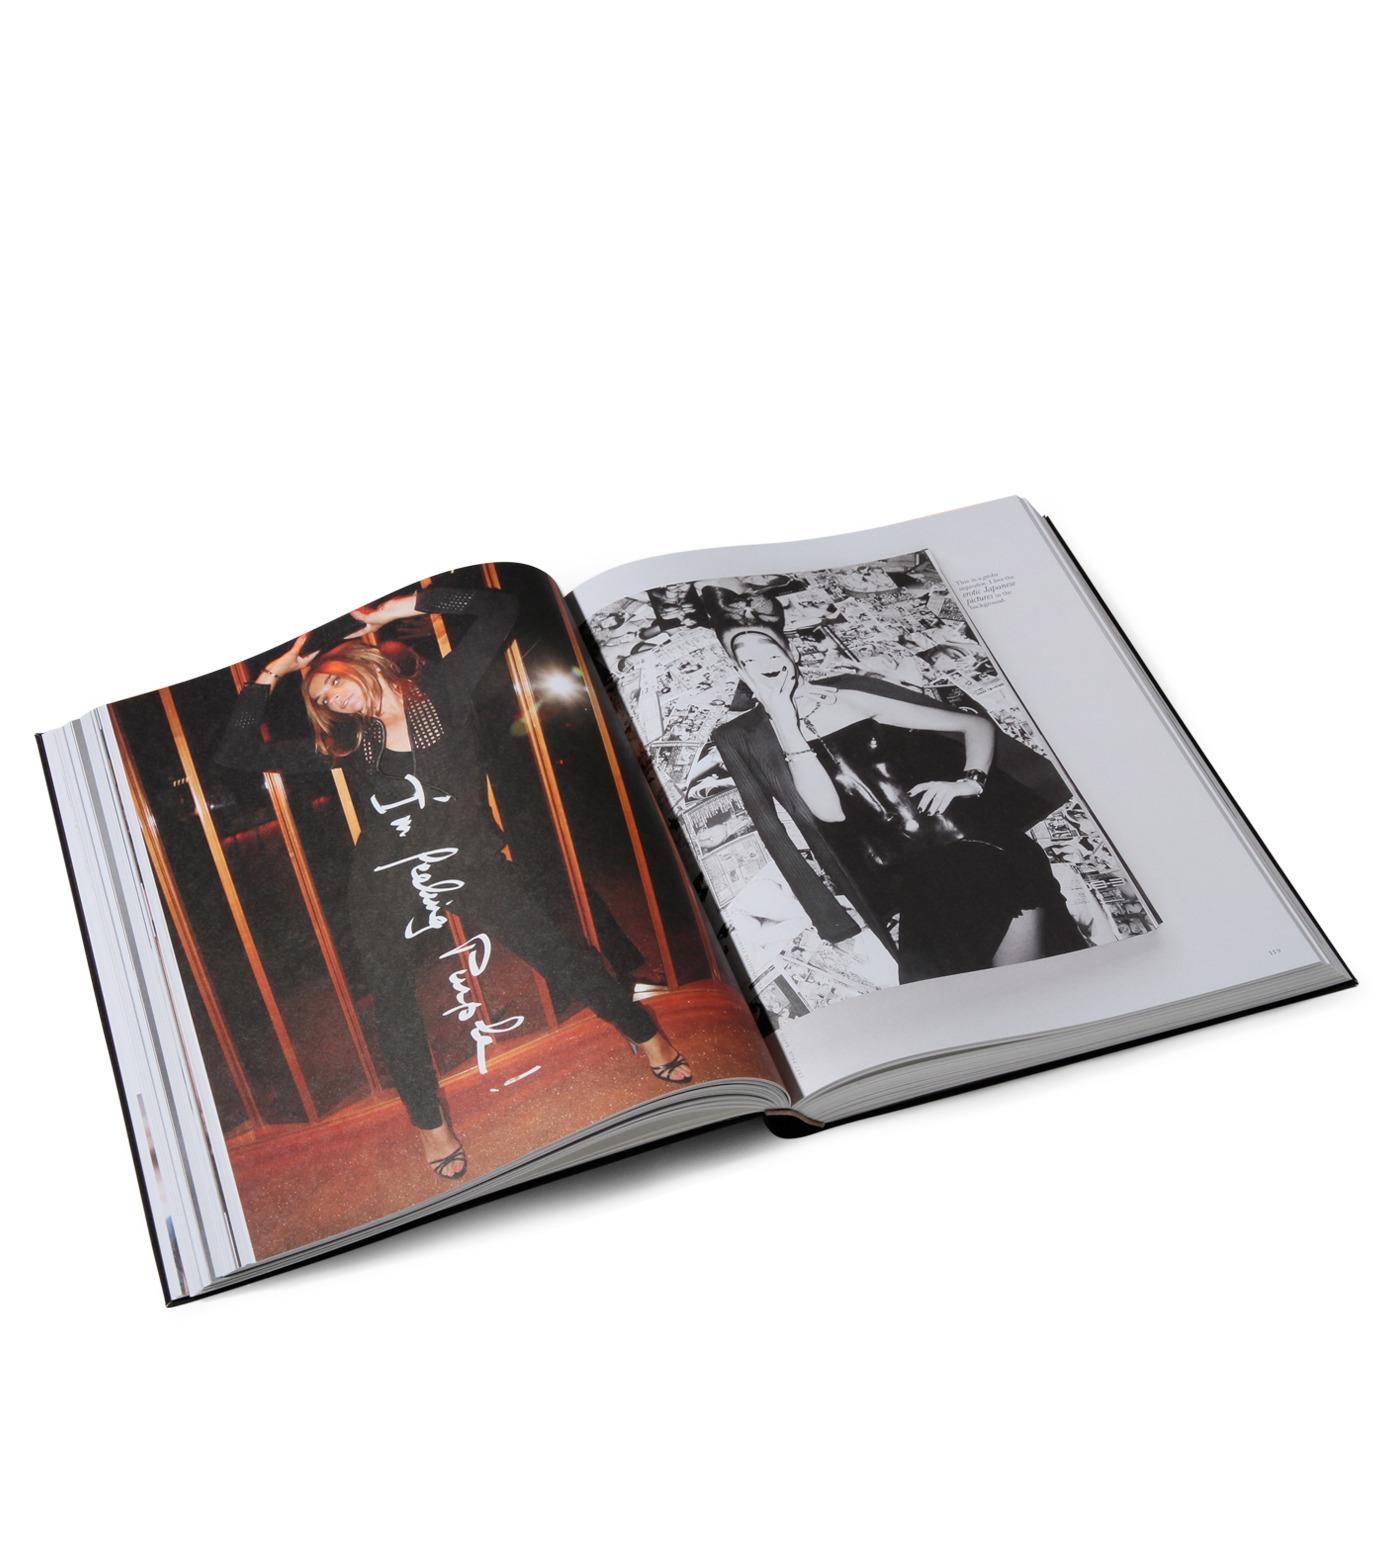 ArtBook(アートブック)のCarine Roitfeld-BLACK(インテリア/OTHER-GOODS/interior/OTHER-GOODS)-0847833689-13 拡大詳細画像3